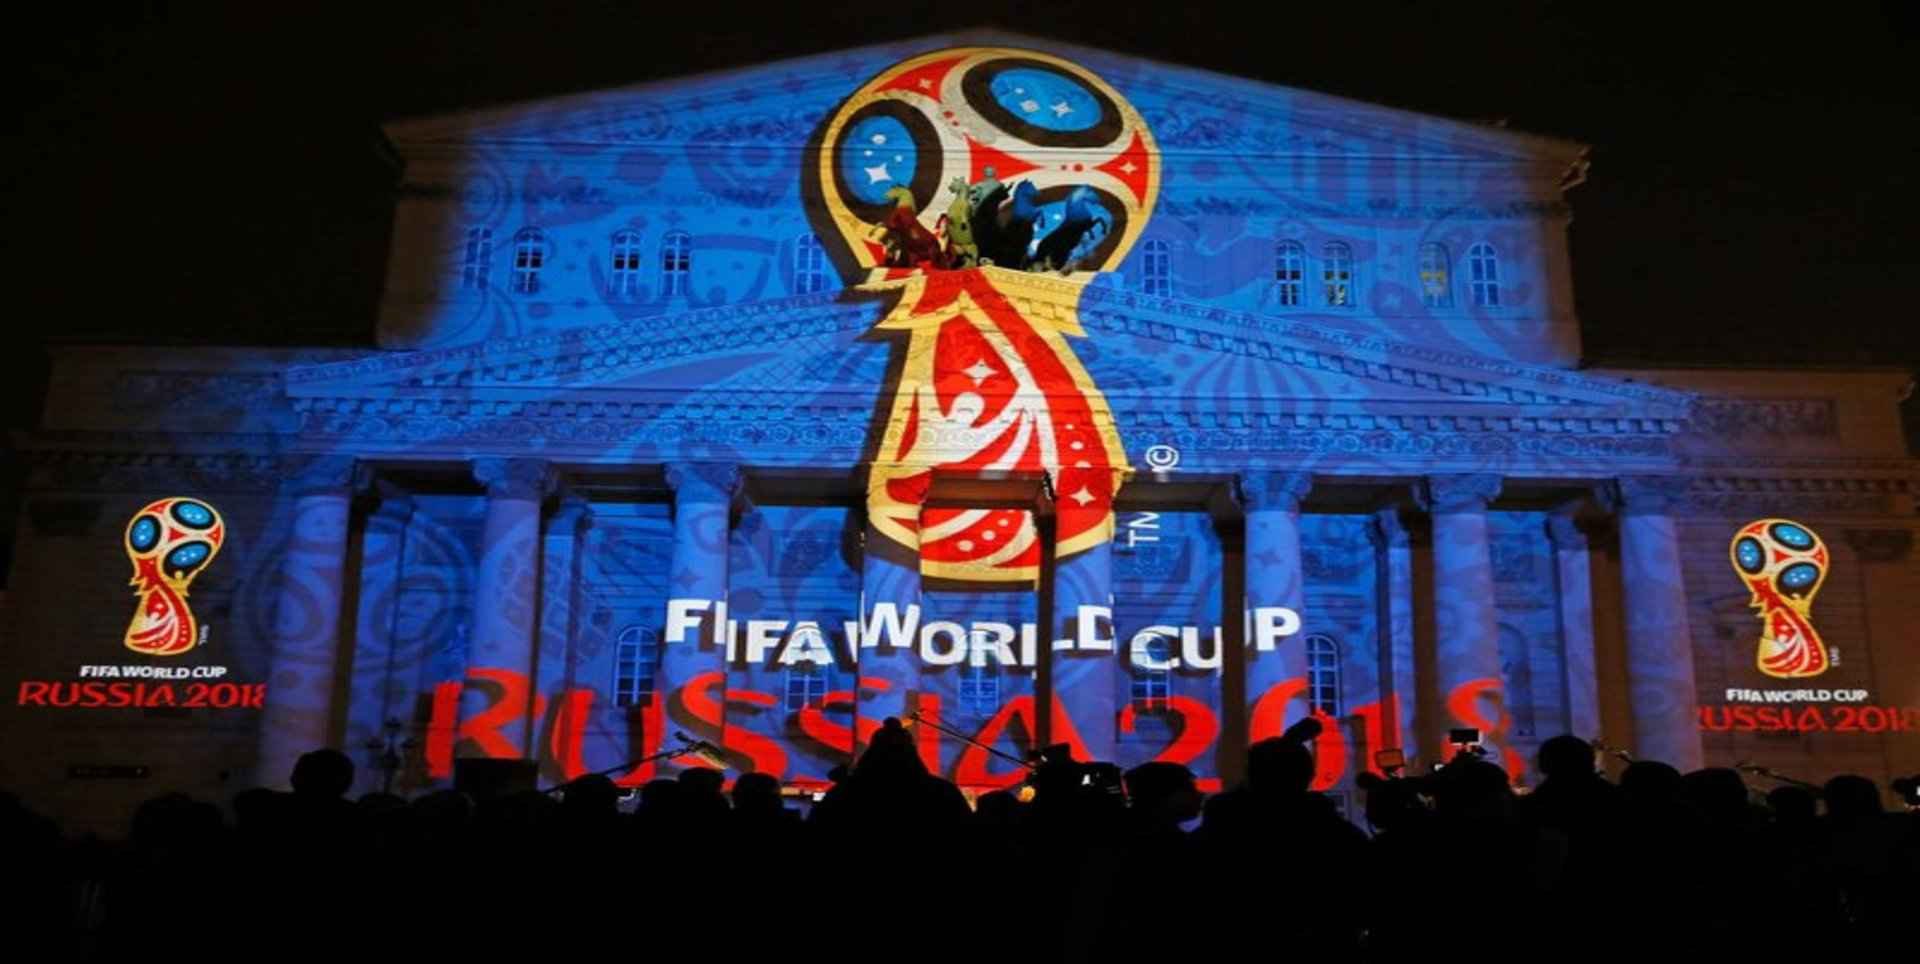 FIFA WC Trinidad and Tobago VS United States Live